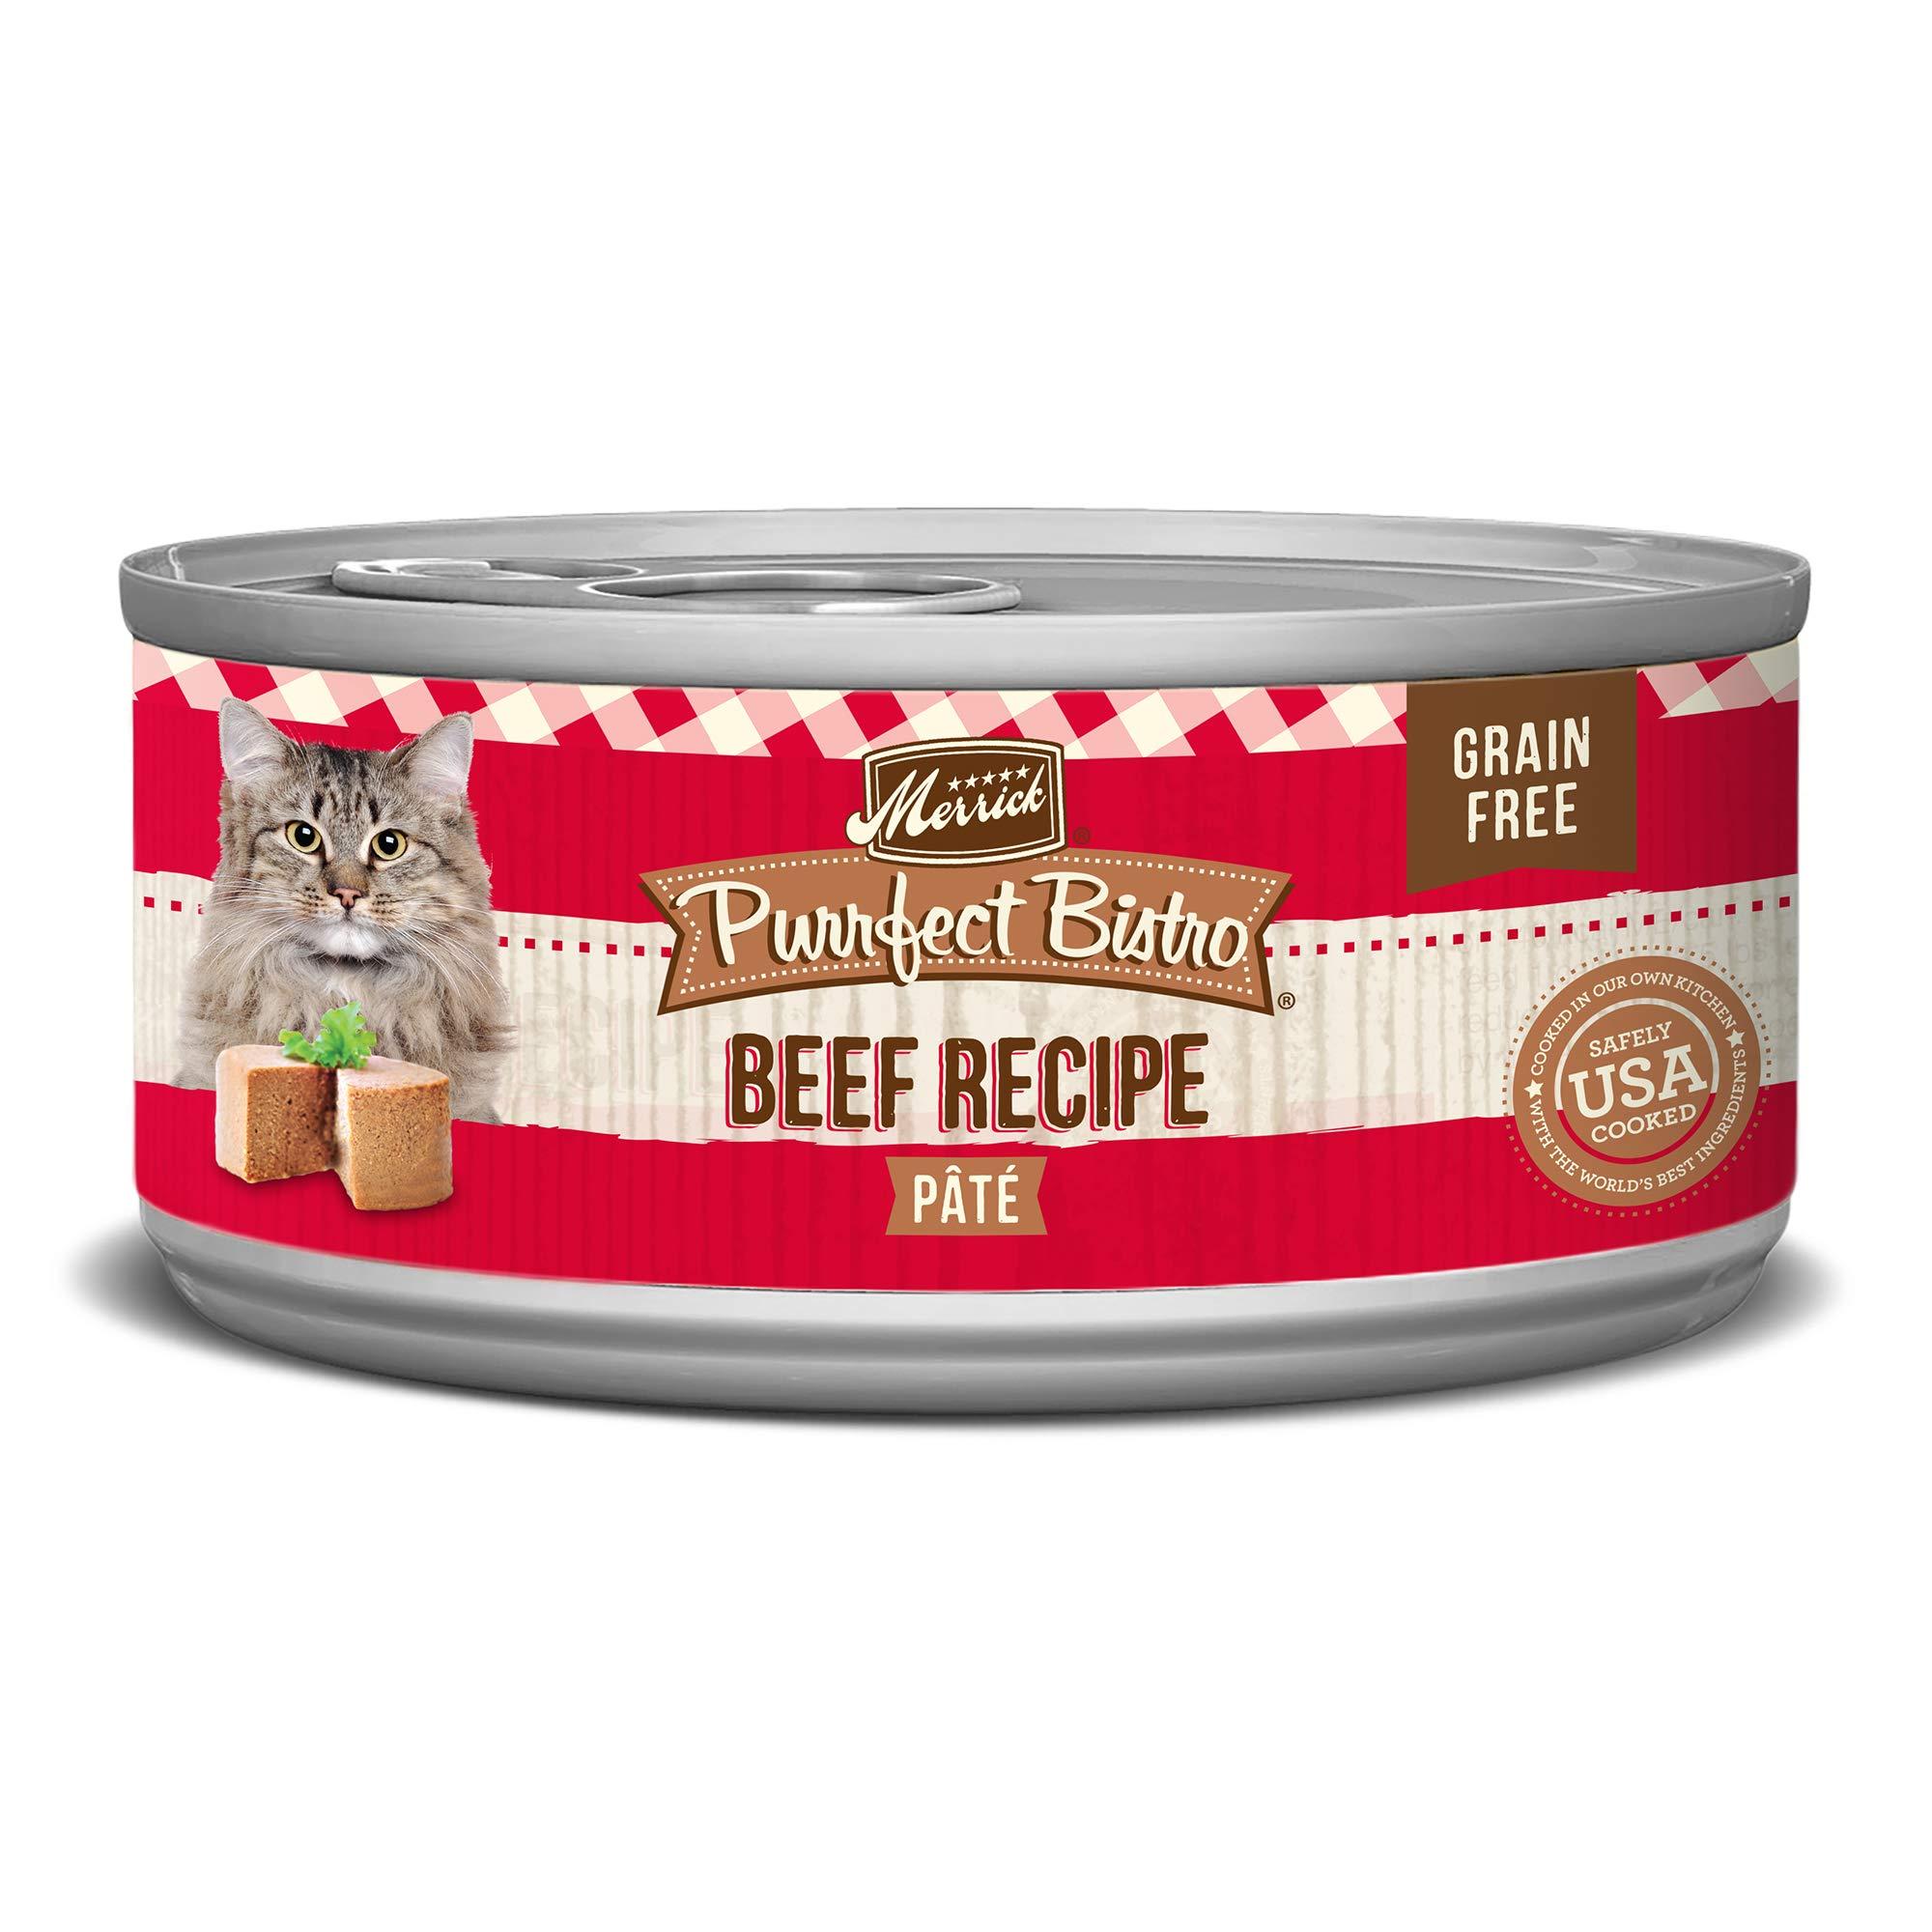 Merrick Purrfect Bistro Grain Free, 5.5 oz, Beef Pate - Pack of 24  by Merrick